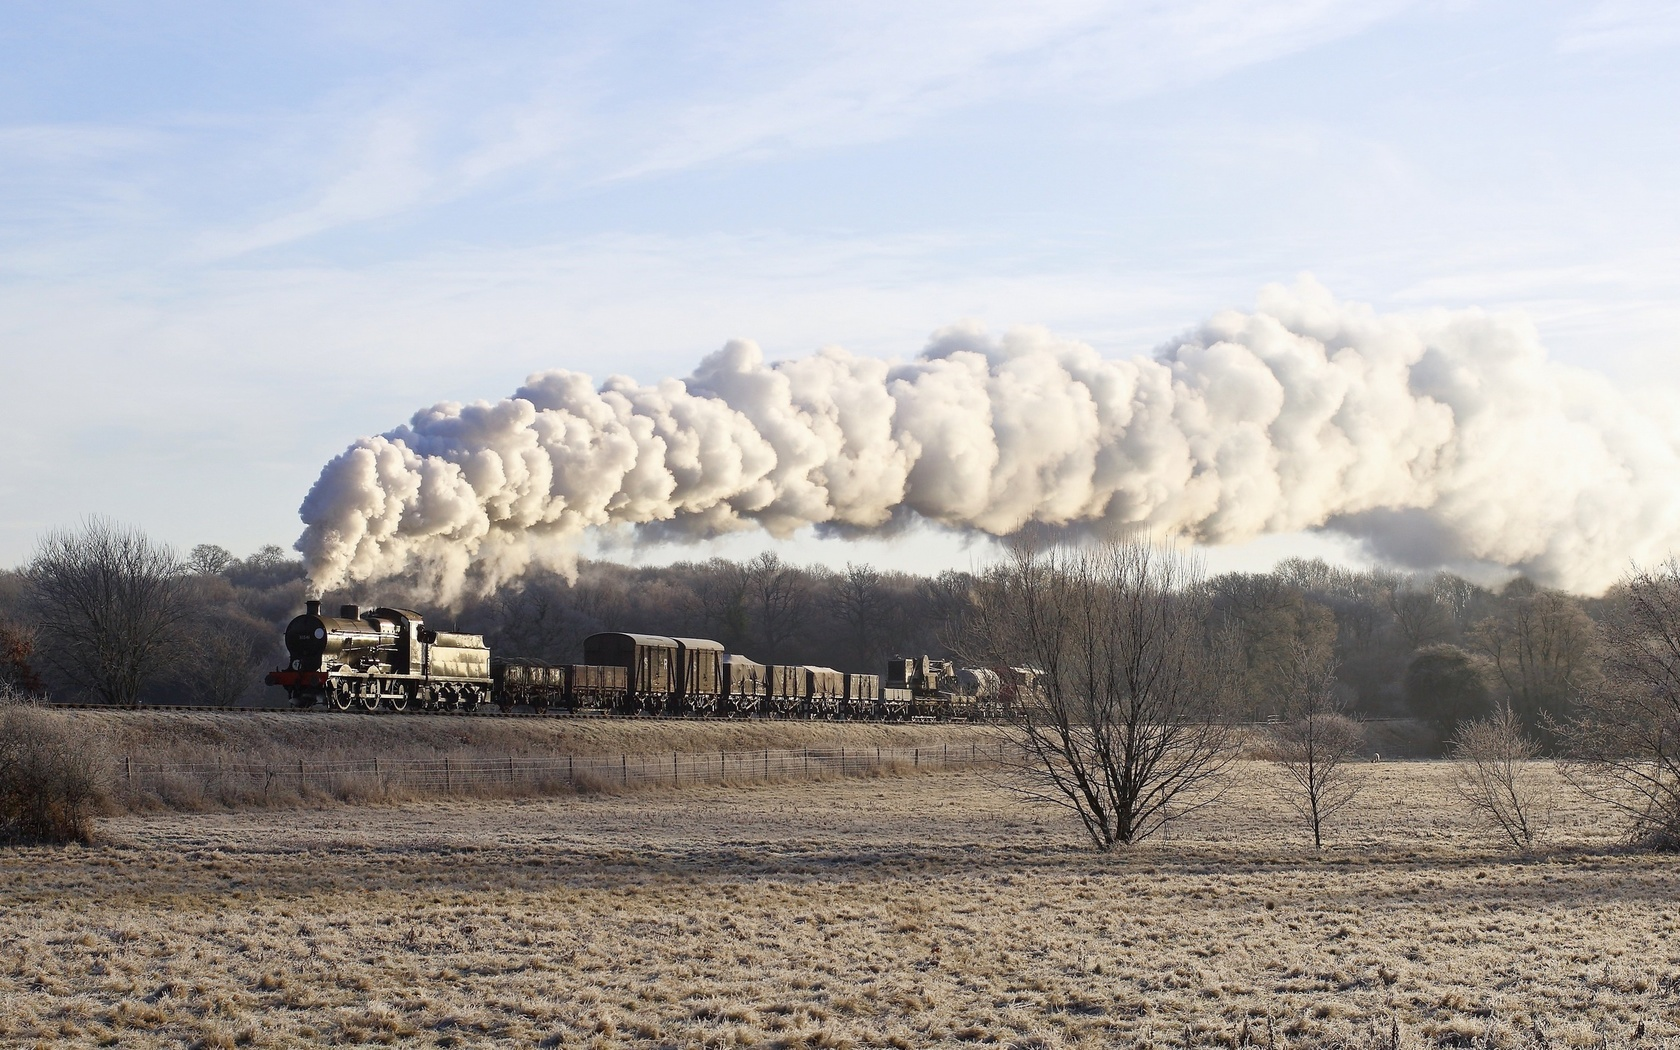 поезд, паровоз, дым